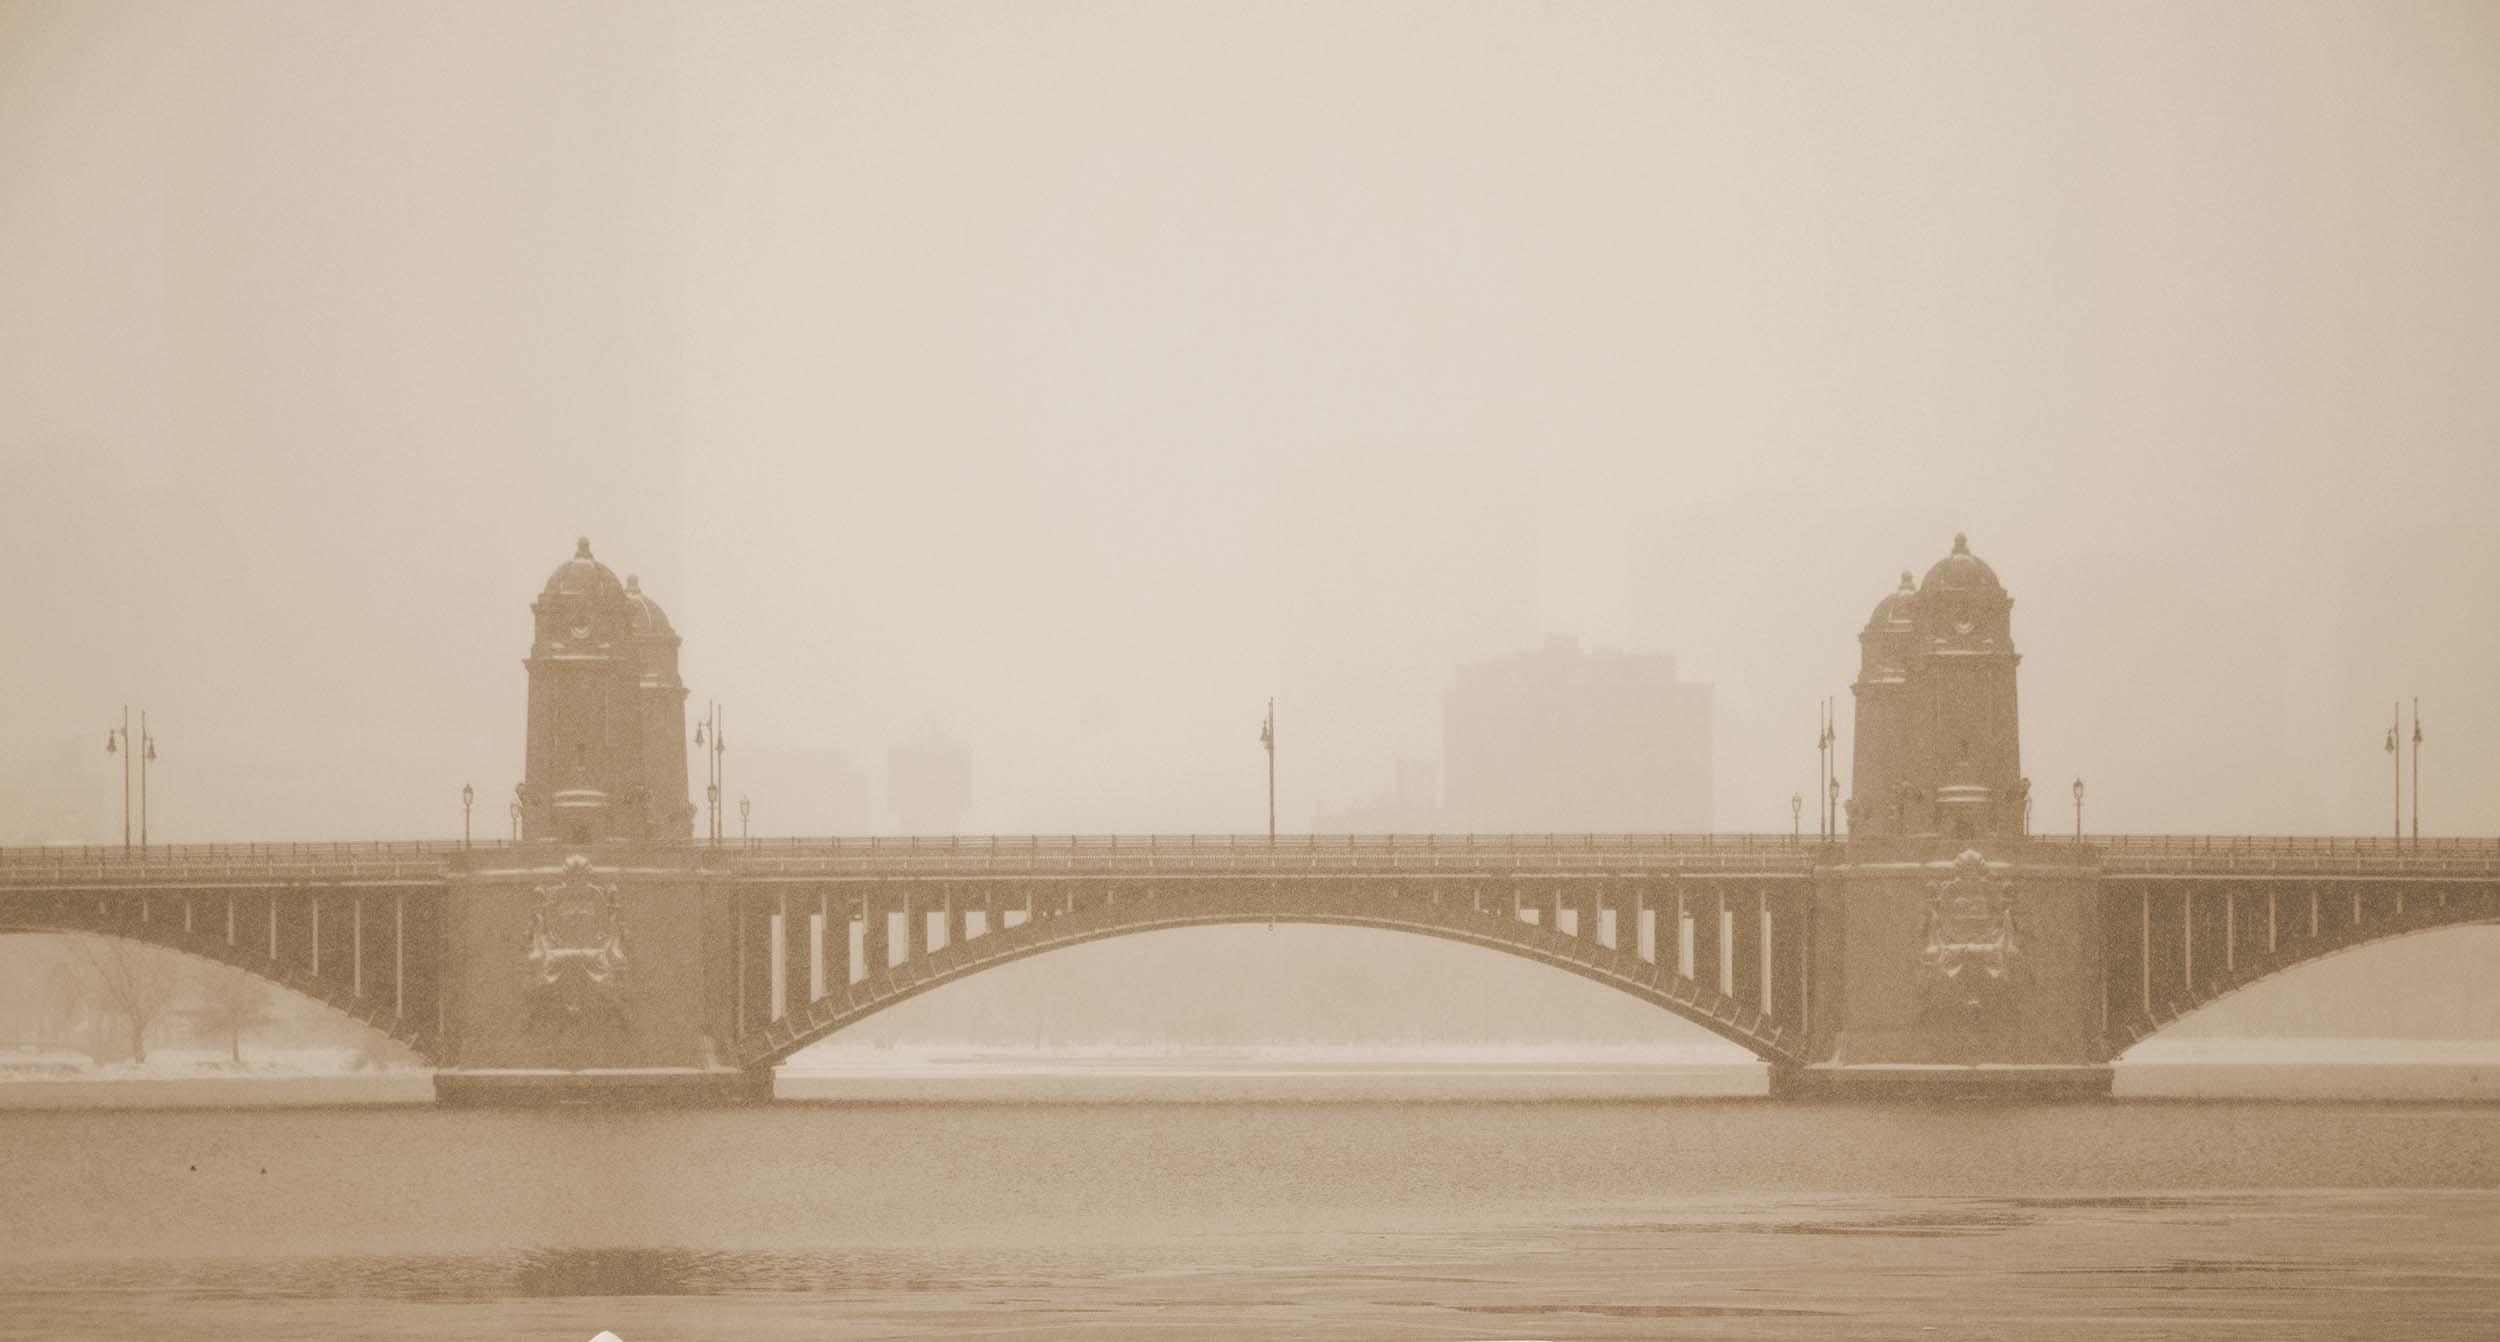 DSC_6996_Longfellow_Bridge_Sepia